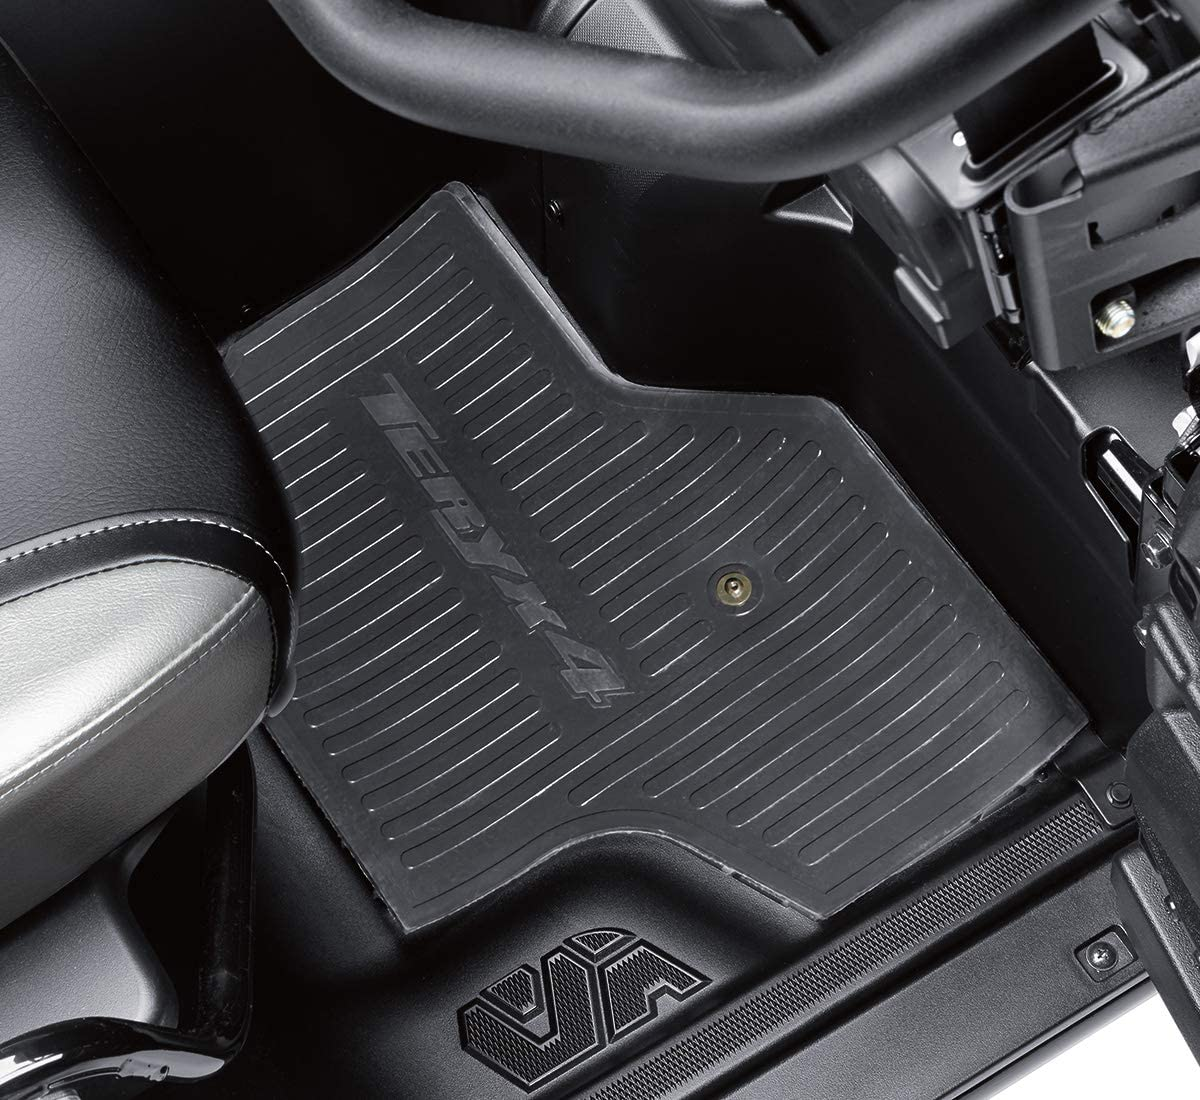 OEM KAWASAKI TERYX 4 2012-2019 Front Floor Mat Set TX750-064